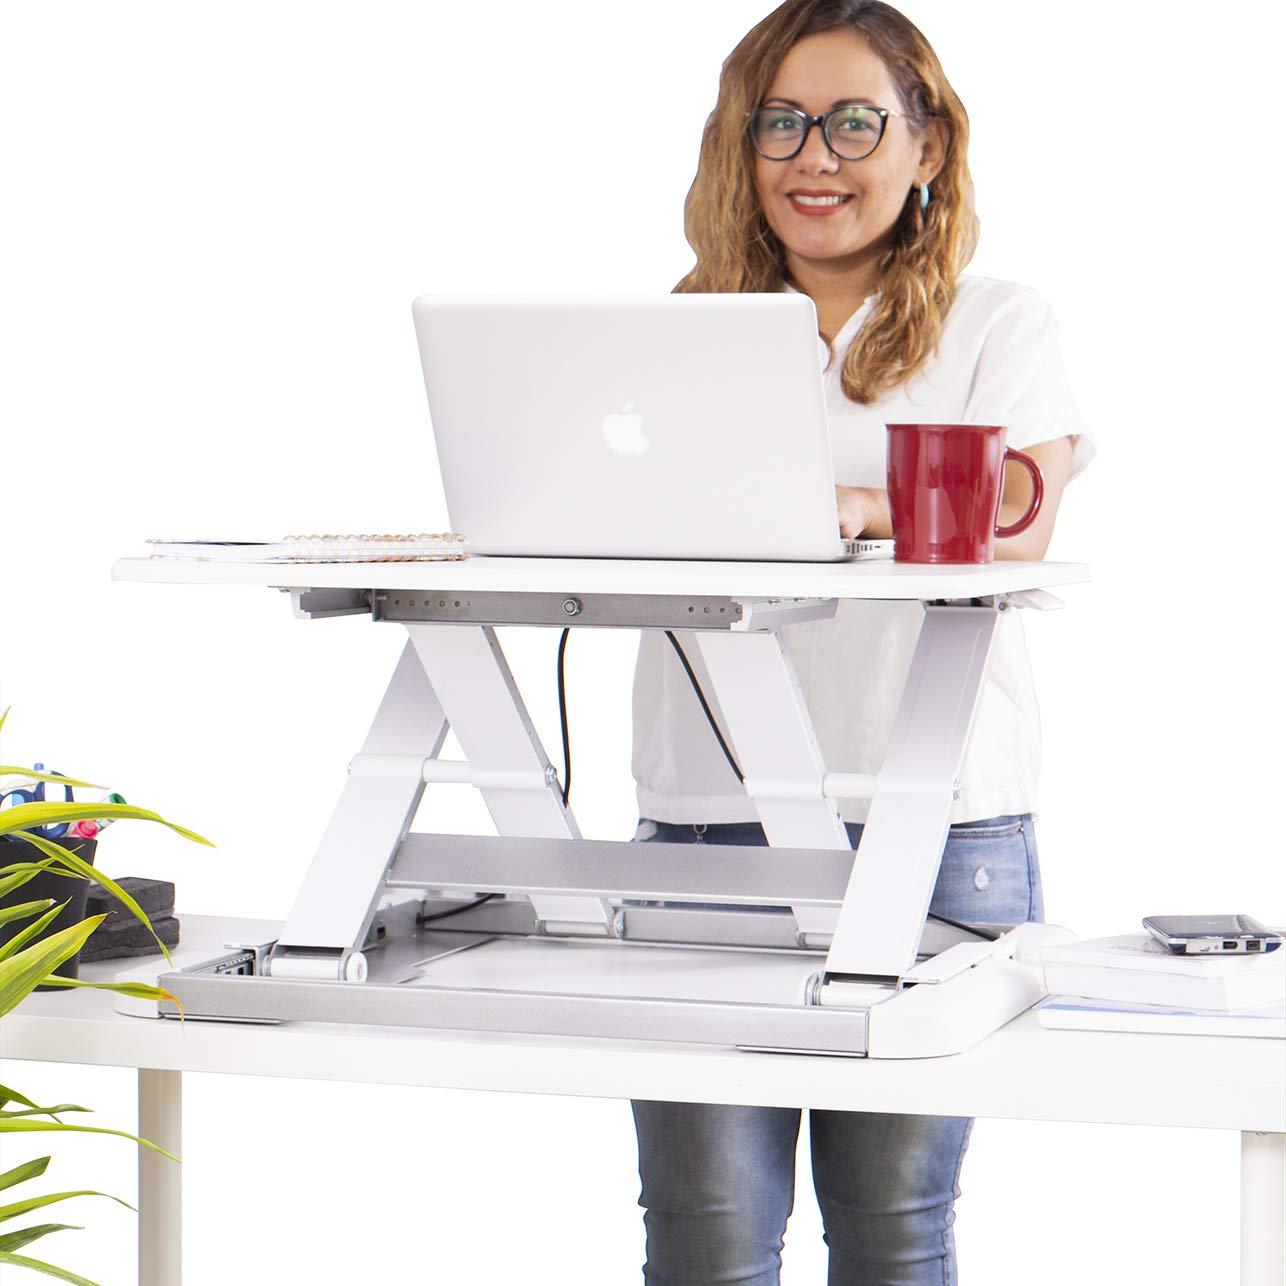 Totalpack Standingデスク – x-elite Pro高さ調節可能デスクコンバータ – サイズ26.5 in X 22.2でデスクに瞬時に変換A Sit/スタンドUpデスク(ブラック) ホワイト WS10450  ホワイト B07MWG5C5H